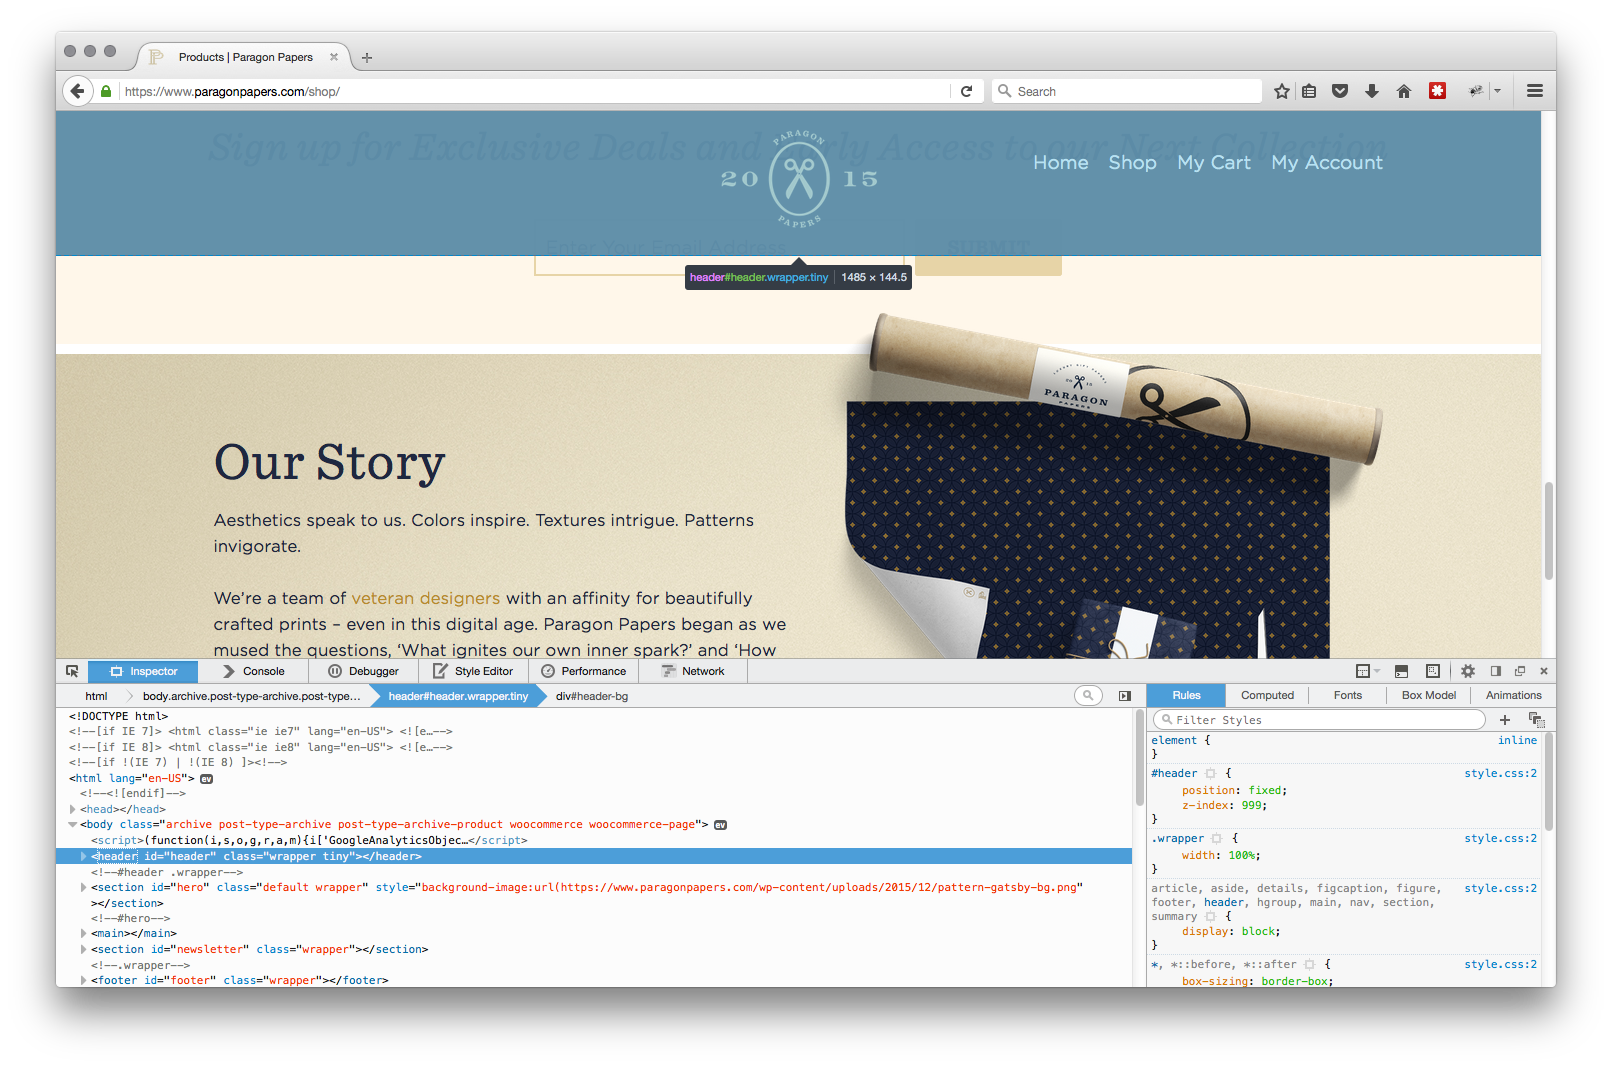 Firefox web inpector